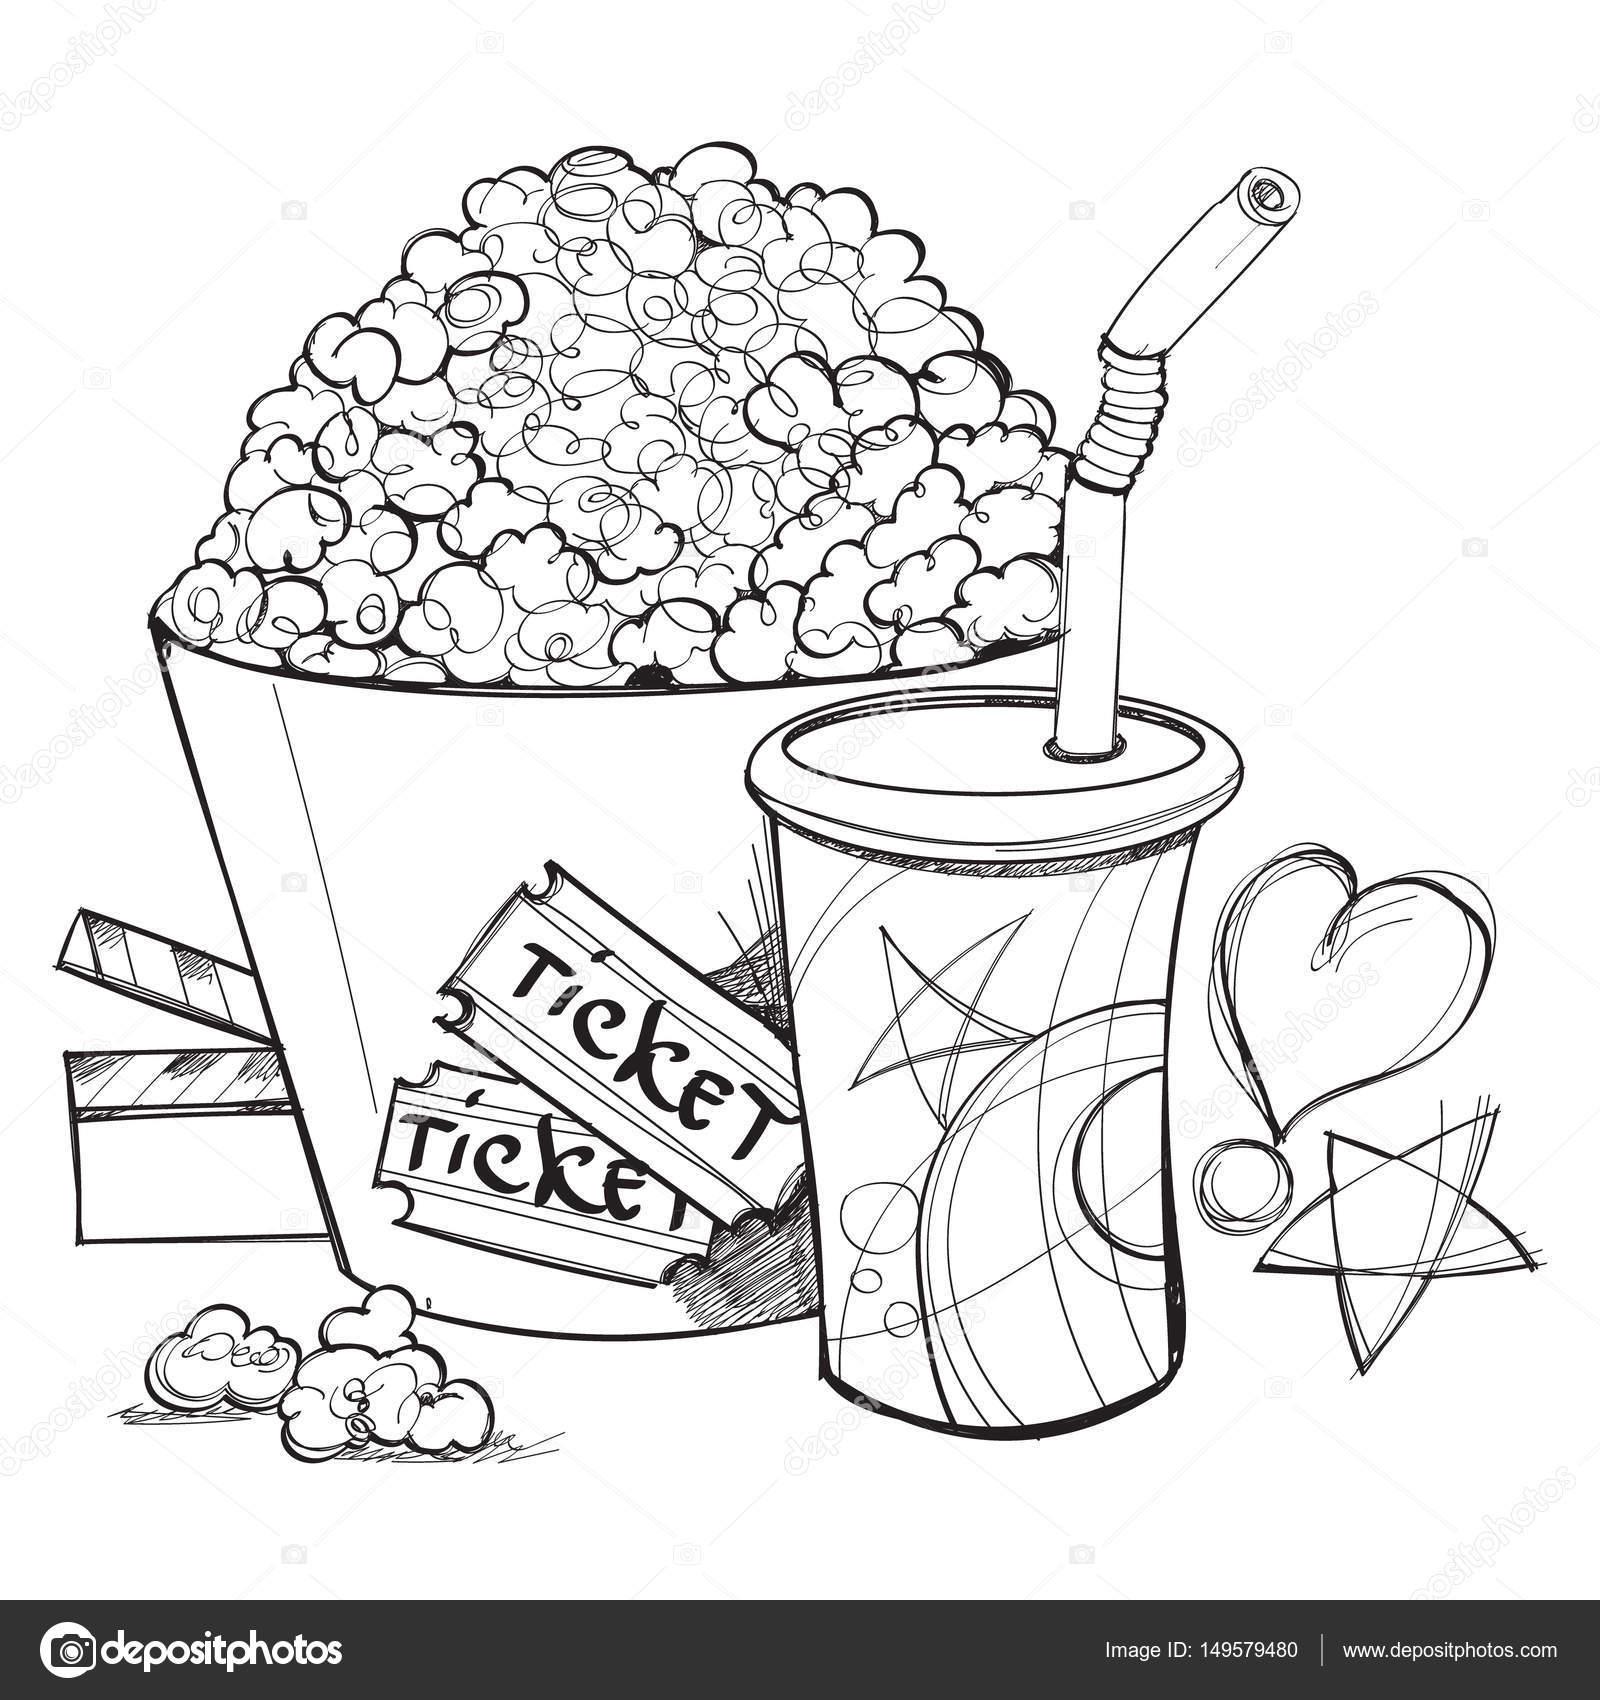 Popcorn kernel drawing | Popcorn and cup of lemonade outline